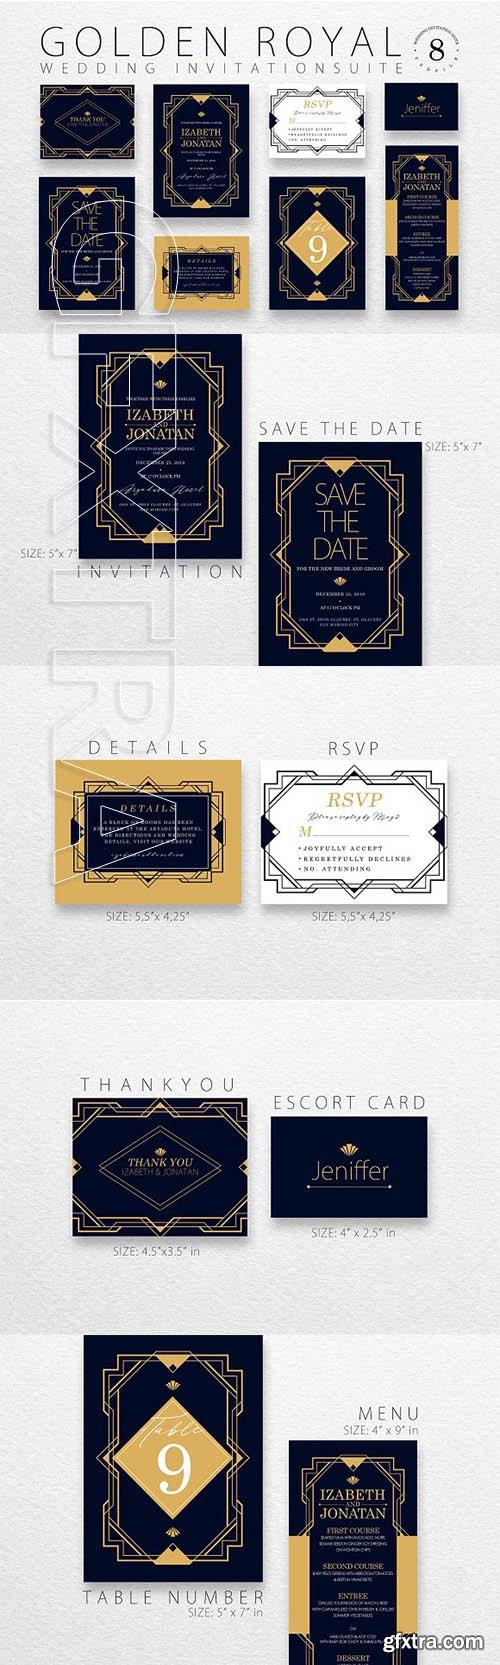 CreativeMarket - Golden Royal - Wedding Suite Ac 74 3052683